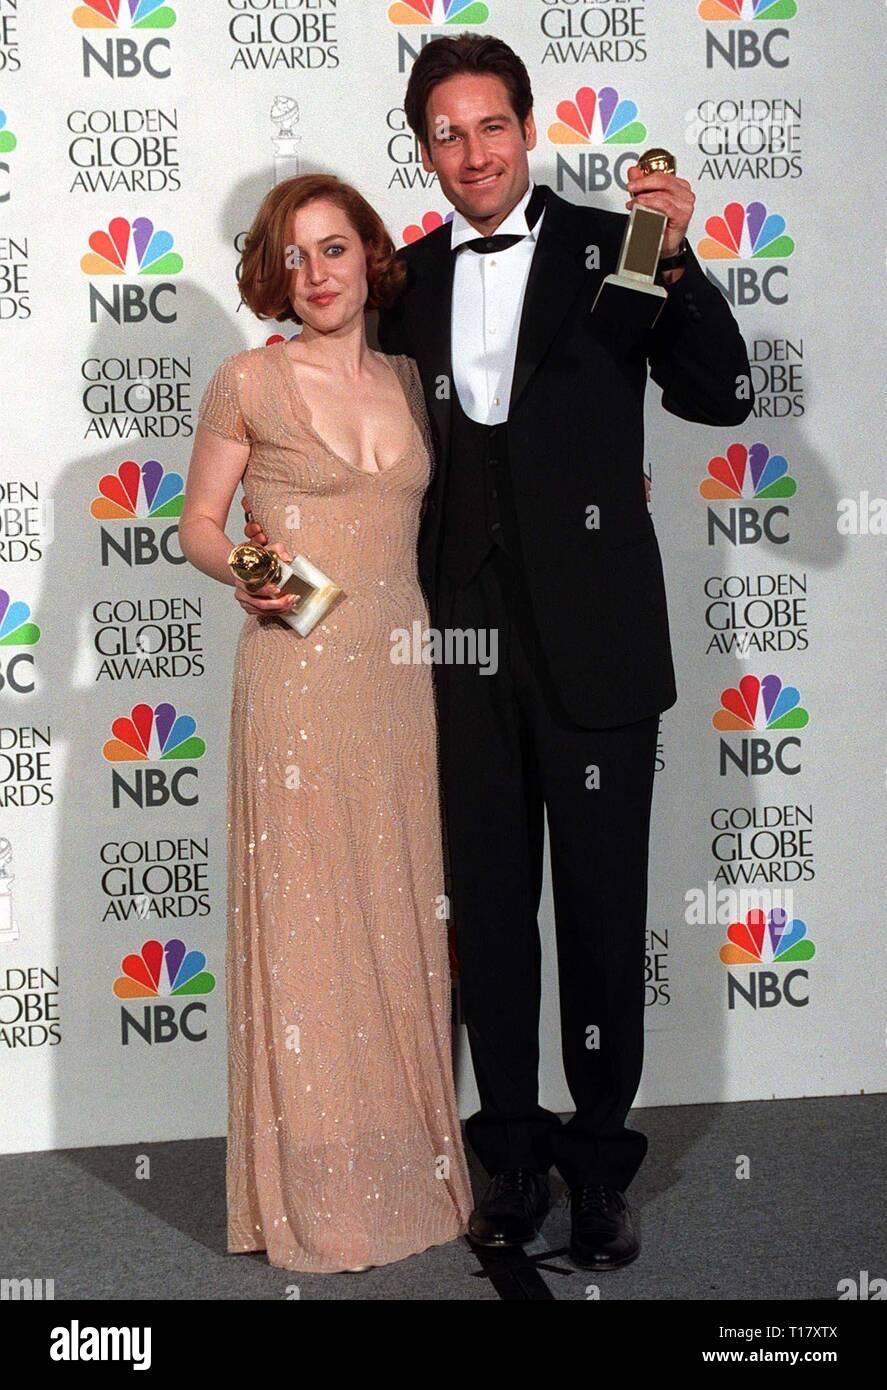 LOS ANGELES, CA. January 19, 1997: 'X-Files' stars David Duchovny & Gillian Anderson at the Golden Globe Awards. - Stock Image